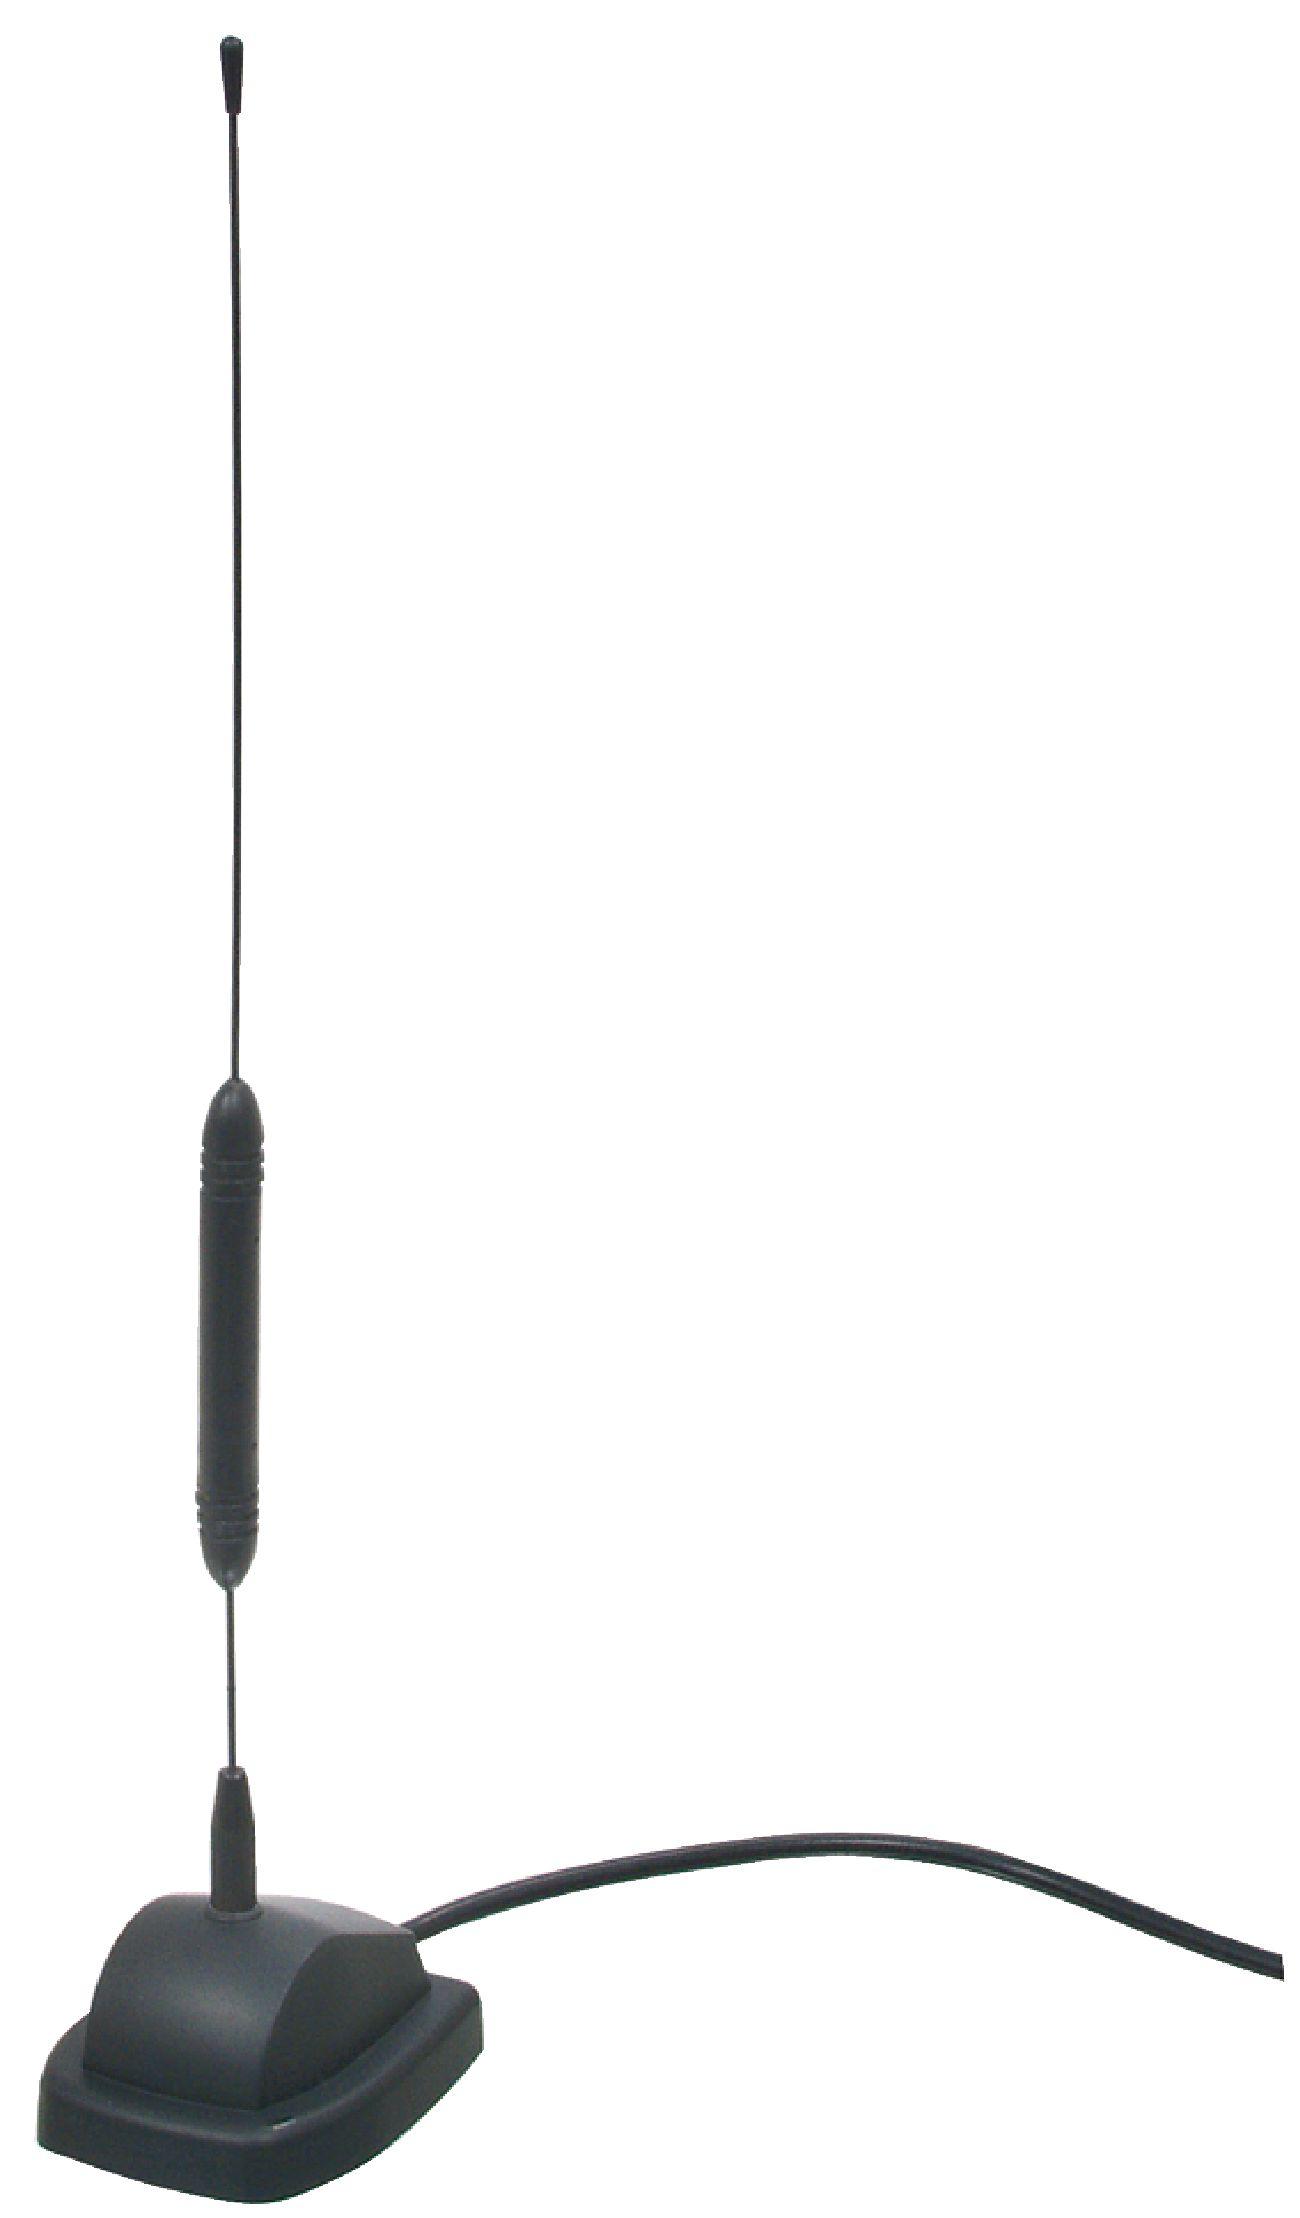 actieve dvb t antenne kn dvbt in10 erc online shop. Black Bedroom Furniture Sets. Home Design Ideas